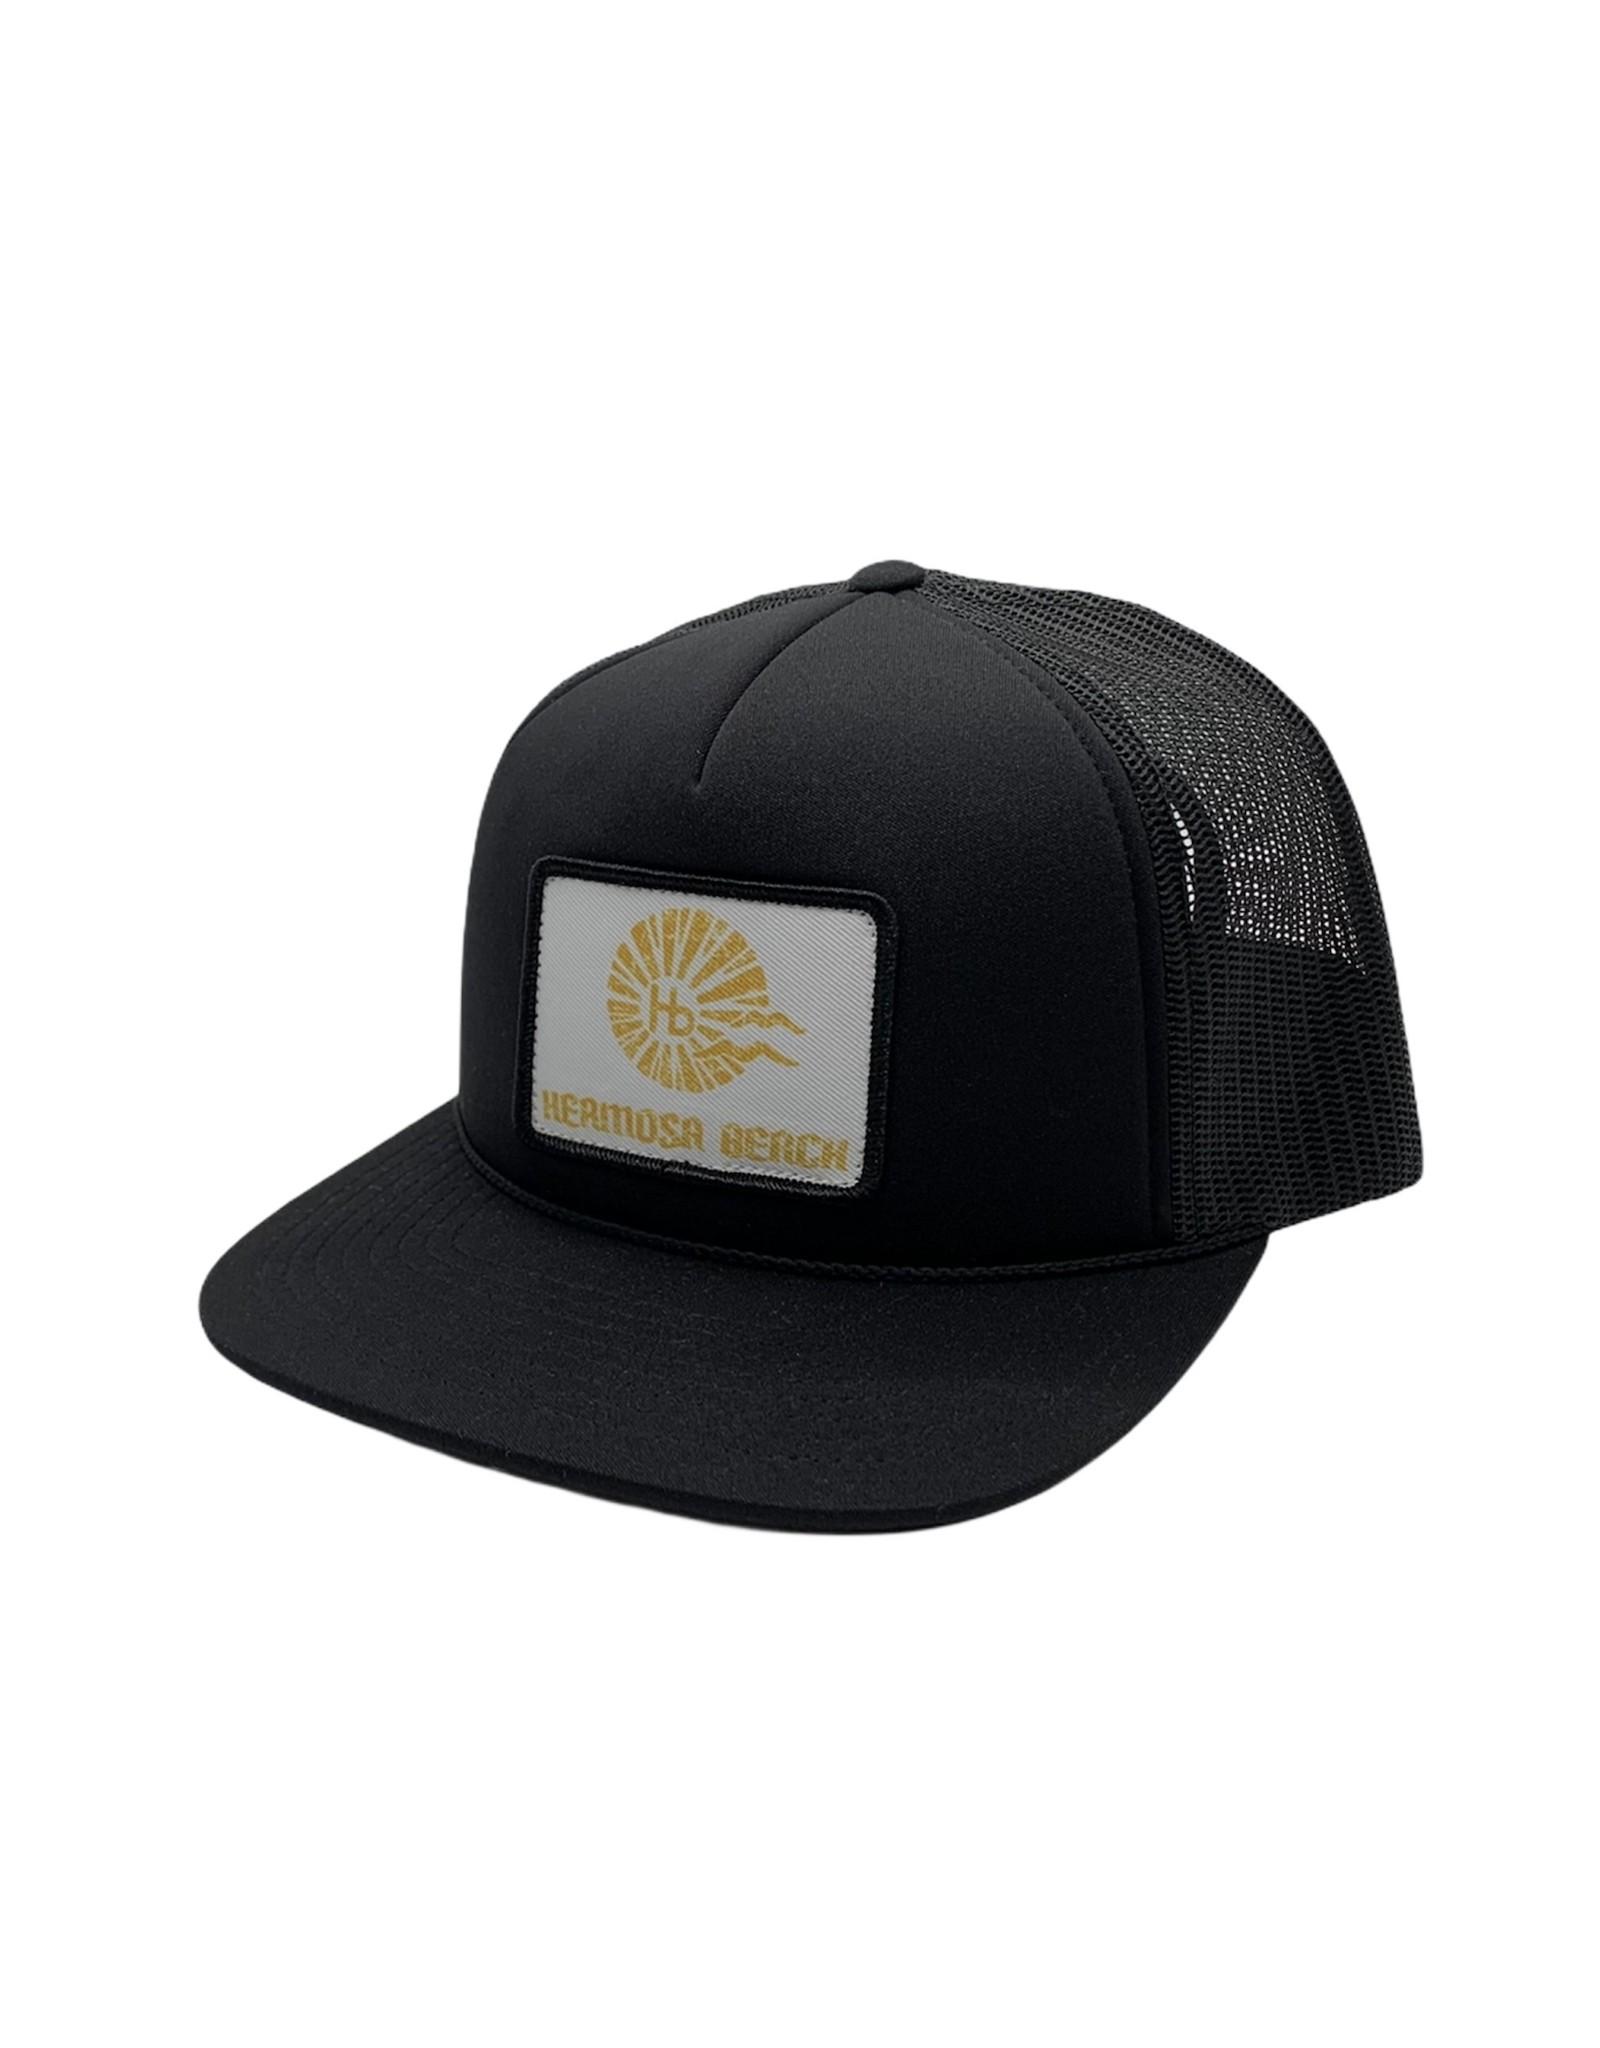 Captuer Headwear #C HB Sunrise Patch FOAM Hat BLACK